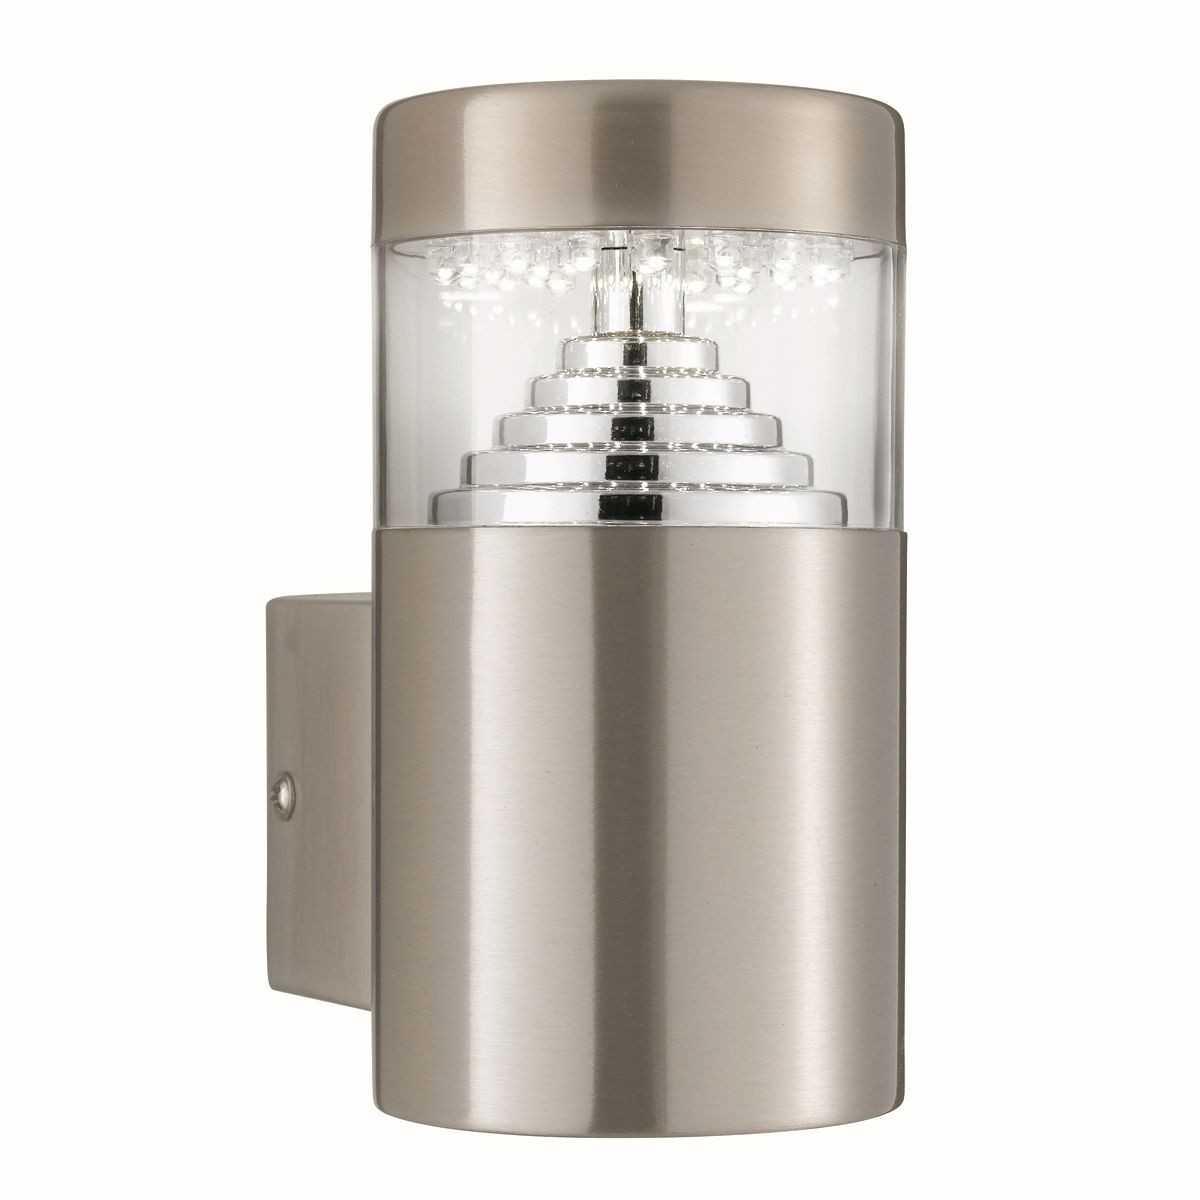 LED Outdoor light  Stainless Steel Wall Light